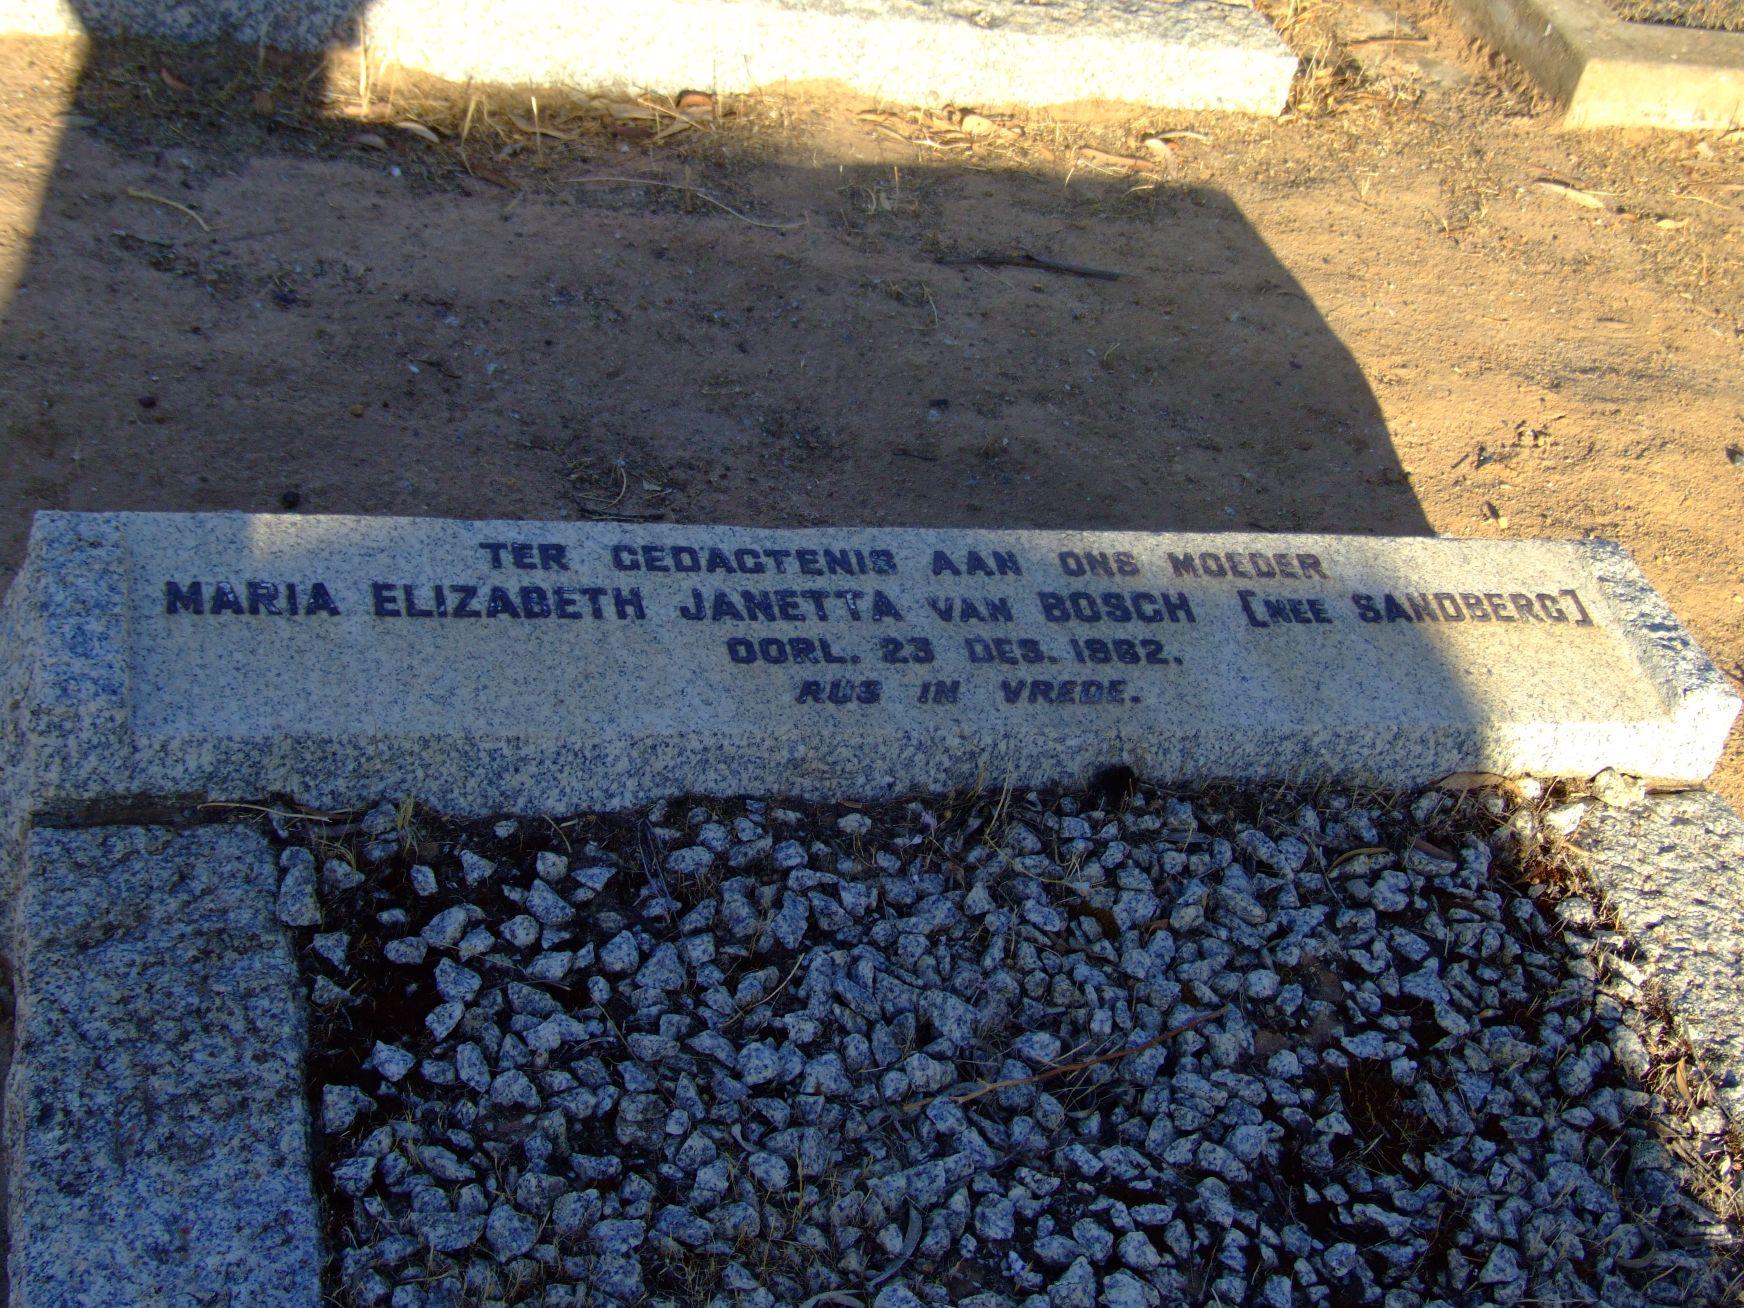 Van Bosch, Maria Elizabeth Janetta